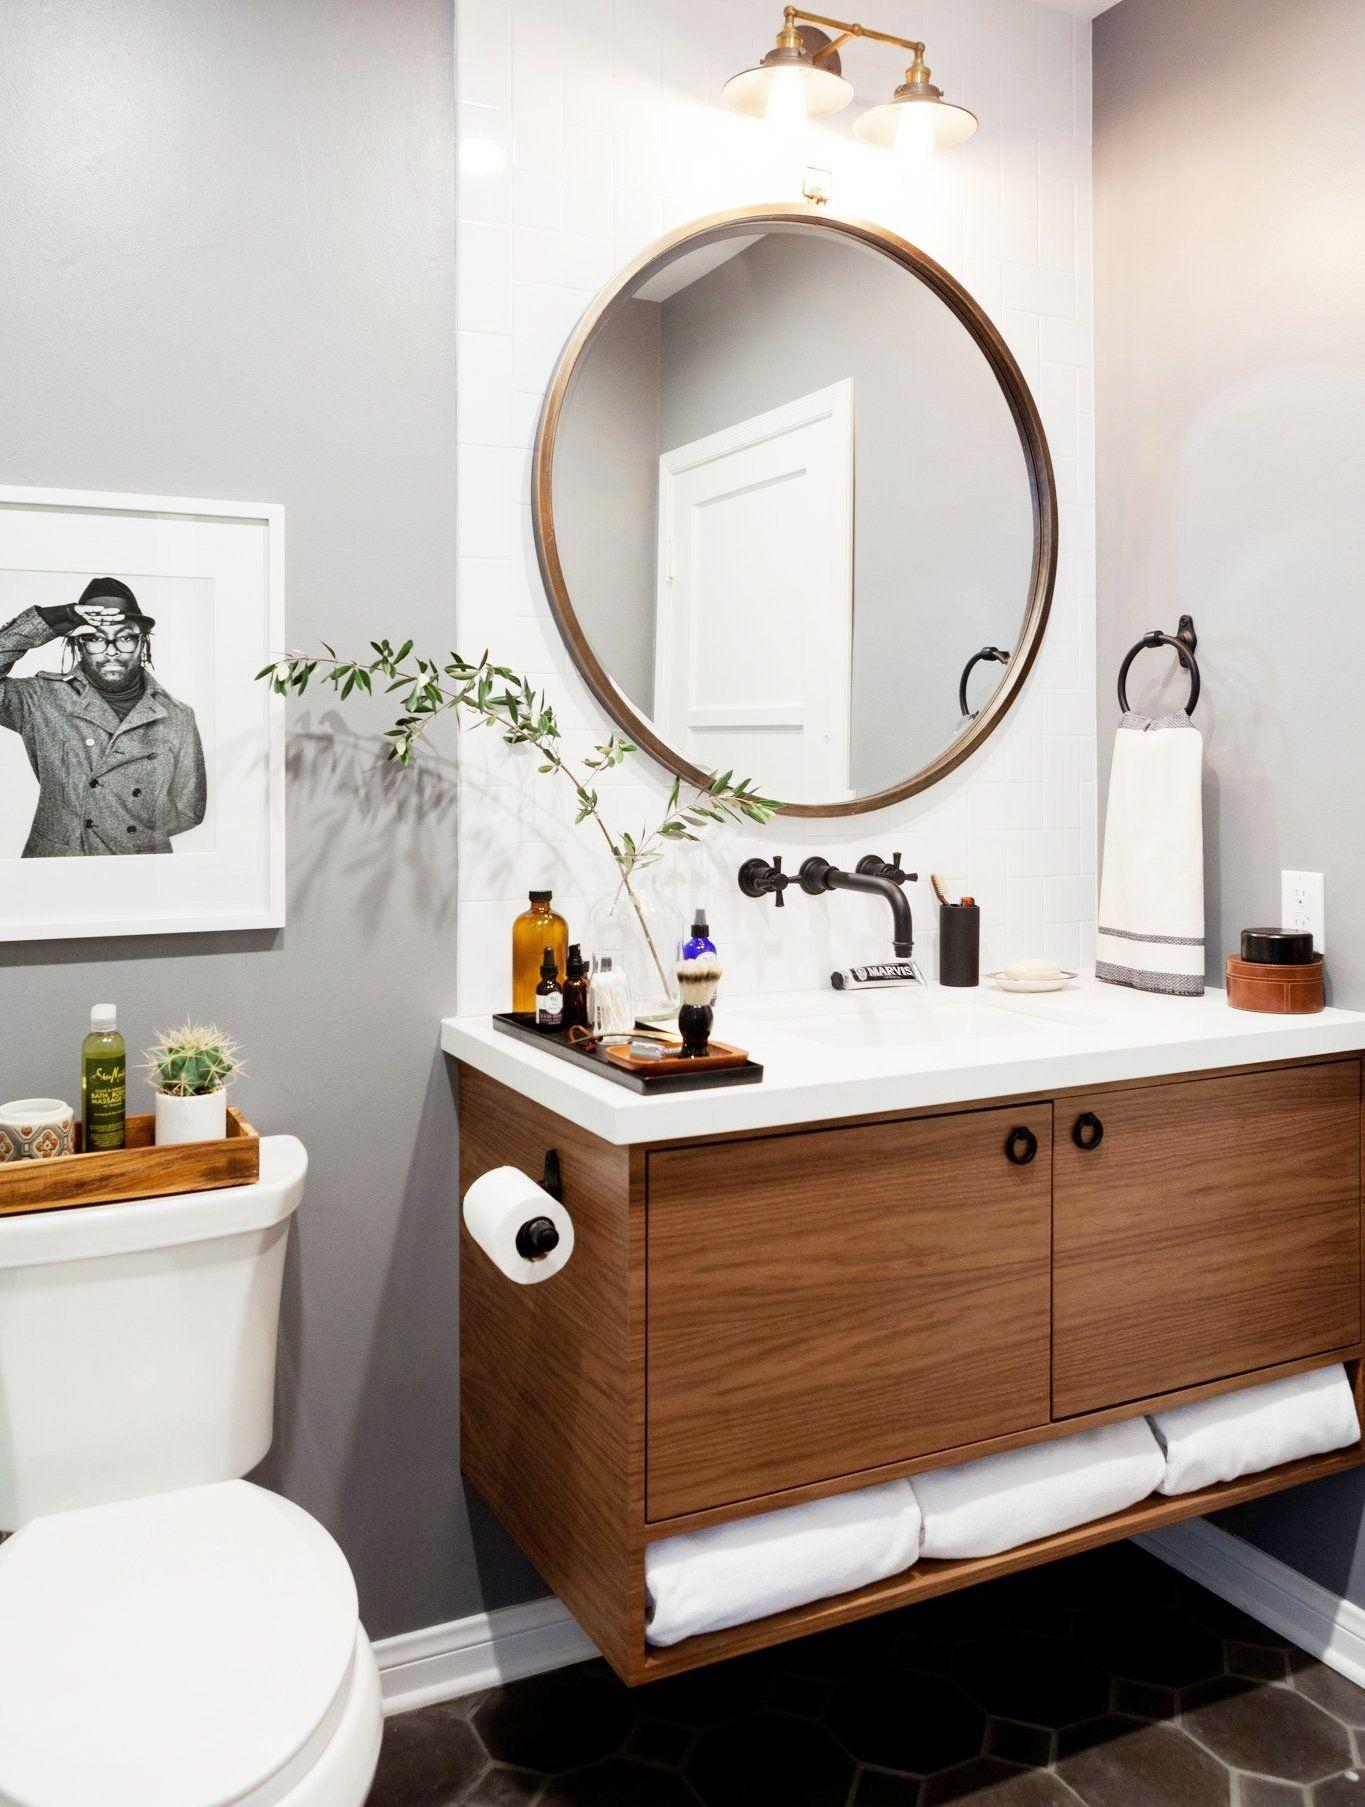 27 Elegant White Bathroom Ideas To Inspire Your Home Round Mirror Bathroom Bathroom Mirror Cabinet Trendy Bathroom